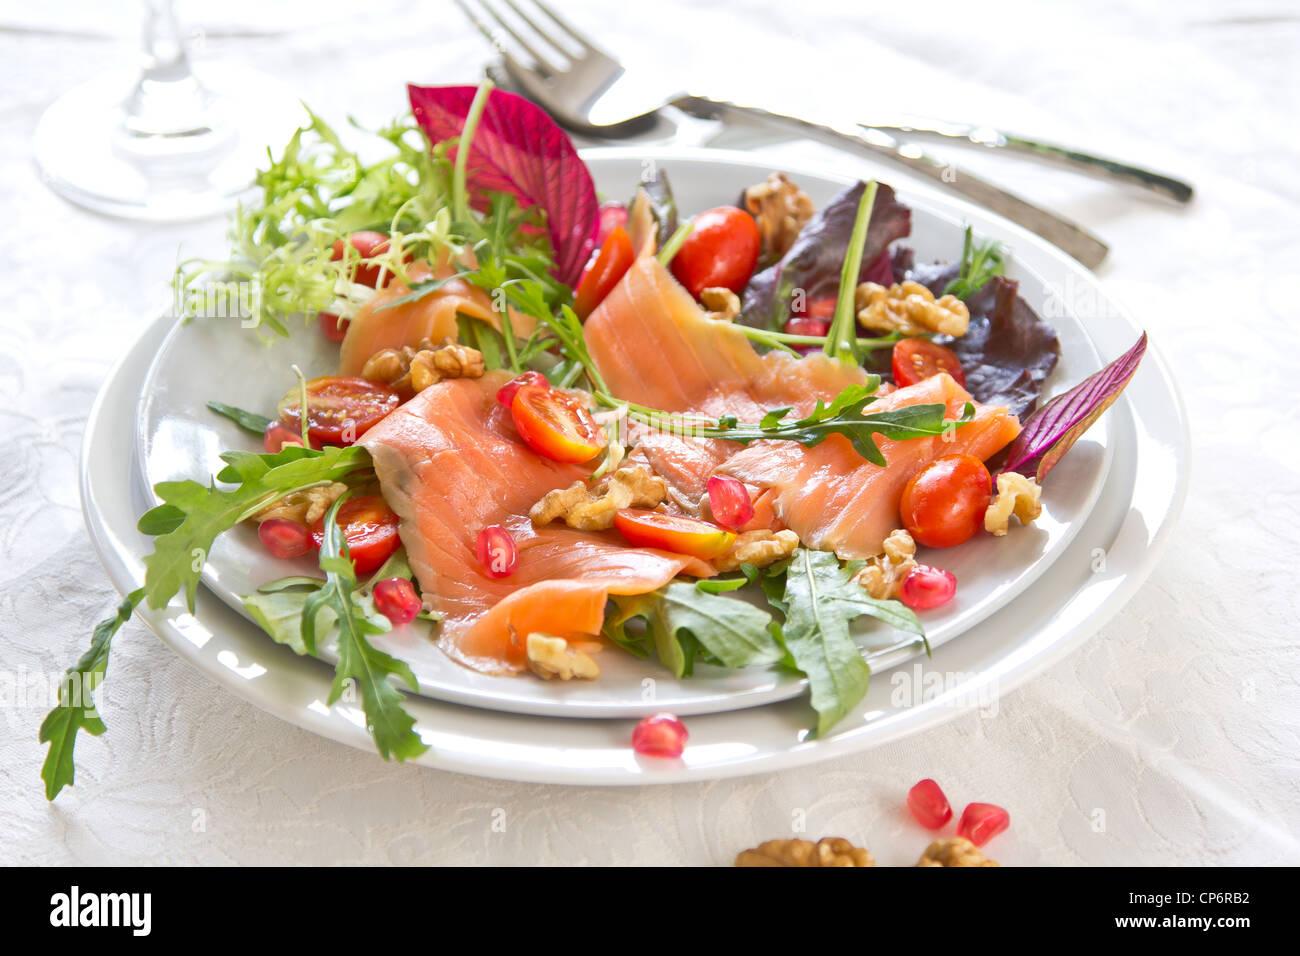 Smoked salmon with pomegranate and walnut salad - Stock Image